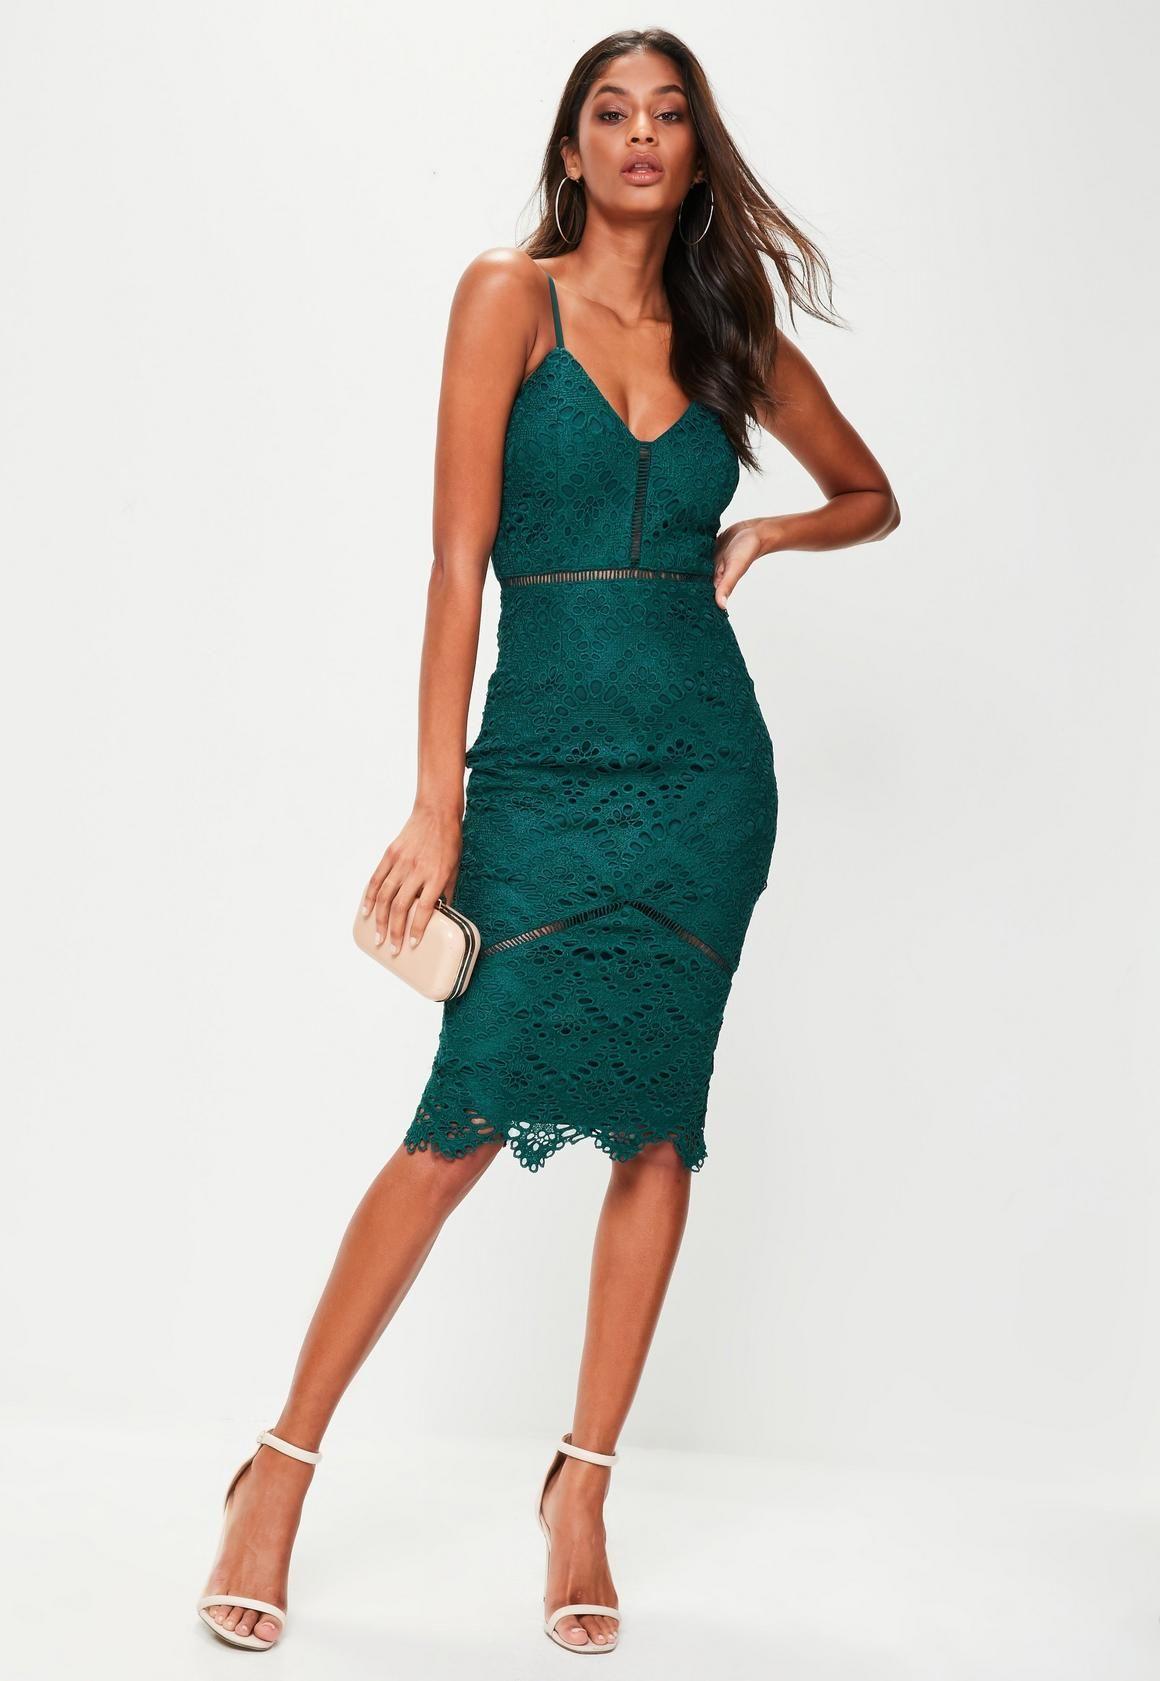 Missguided Zielona Koronkowa Sukienka Midi Green Lace Midi Dress Lace Midi Dress Missguided Dress